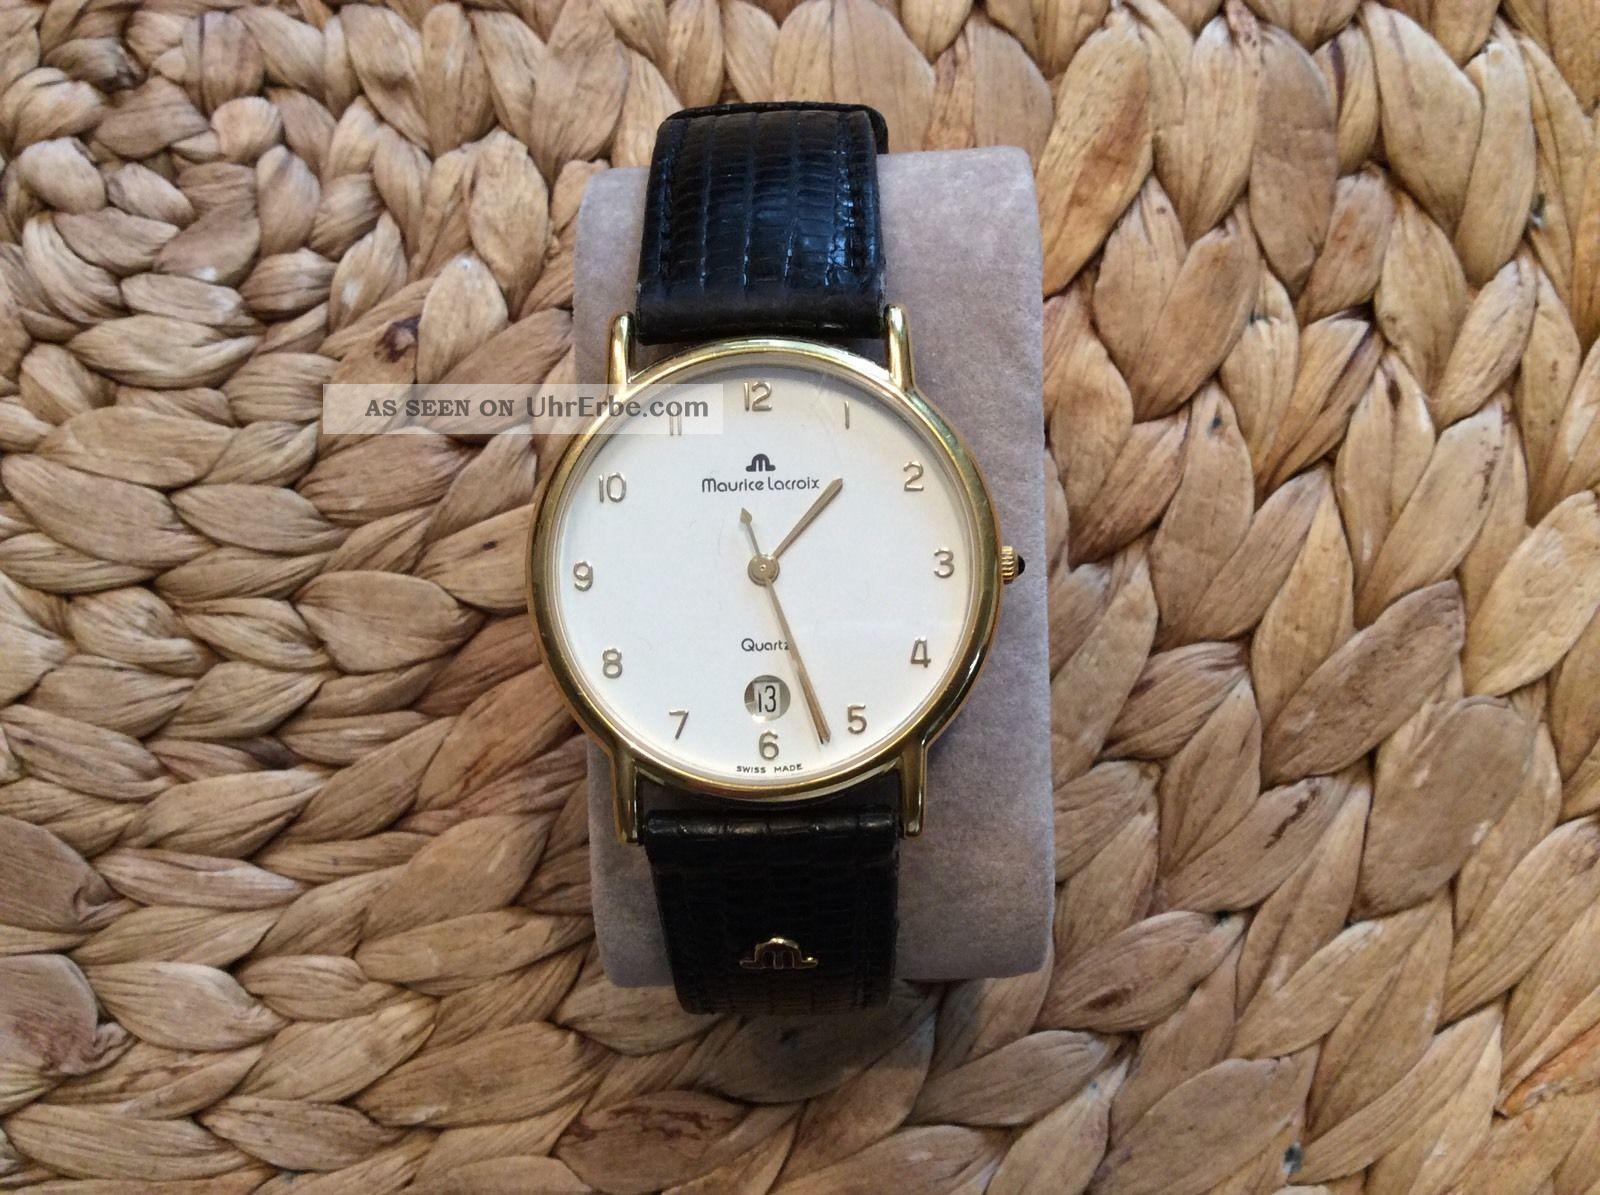 Maurice Lacroix Herrenuhr Kellerfund Armbanduhren Bild